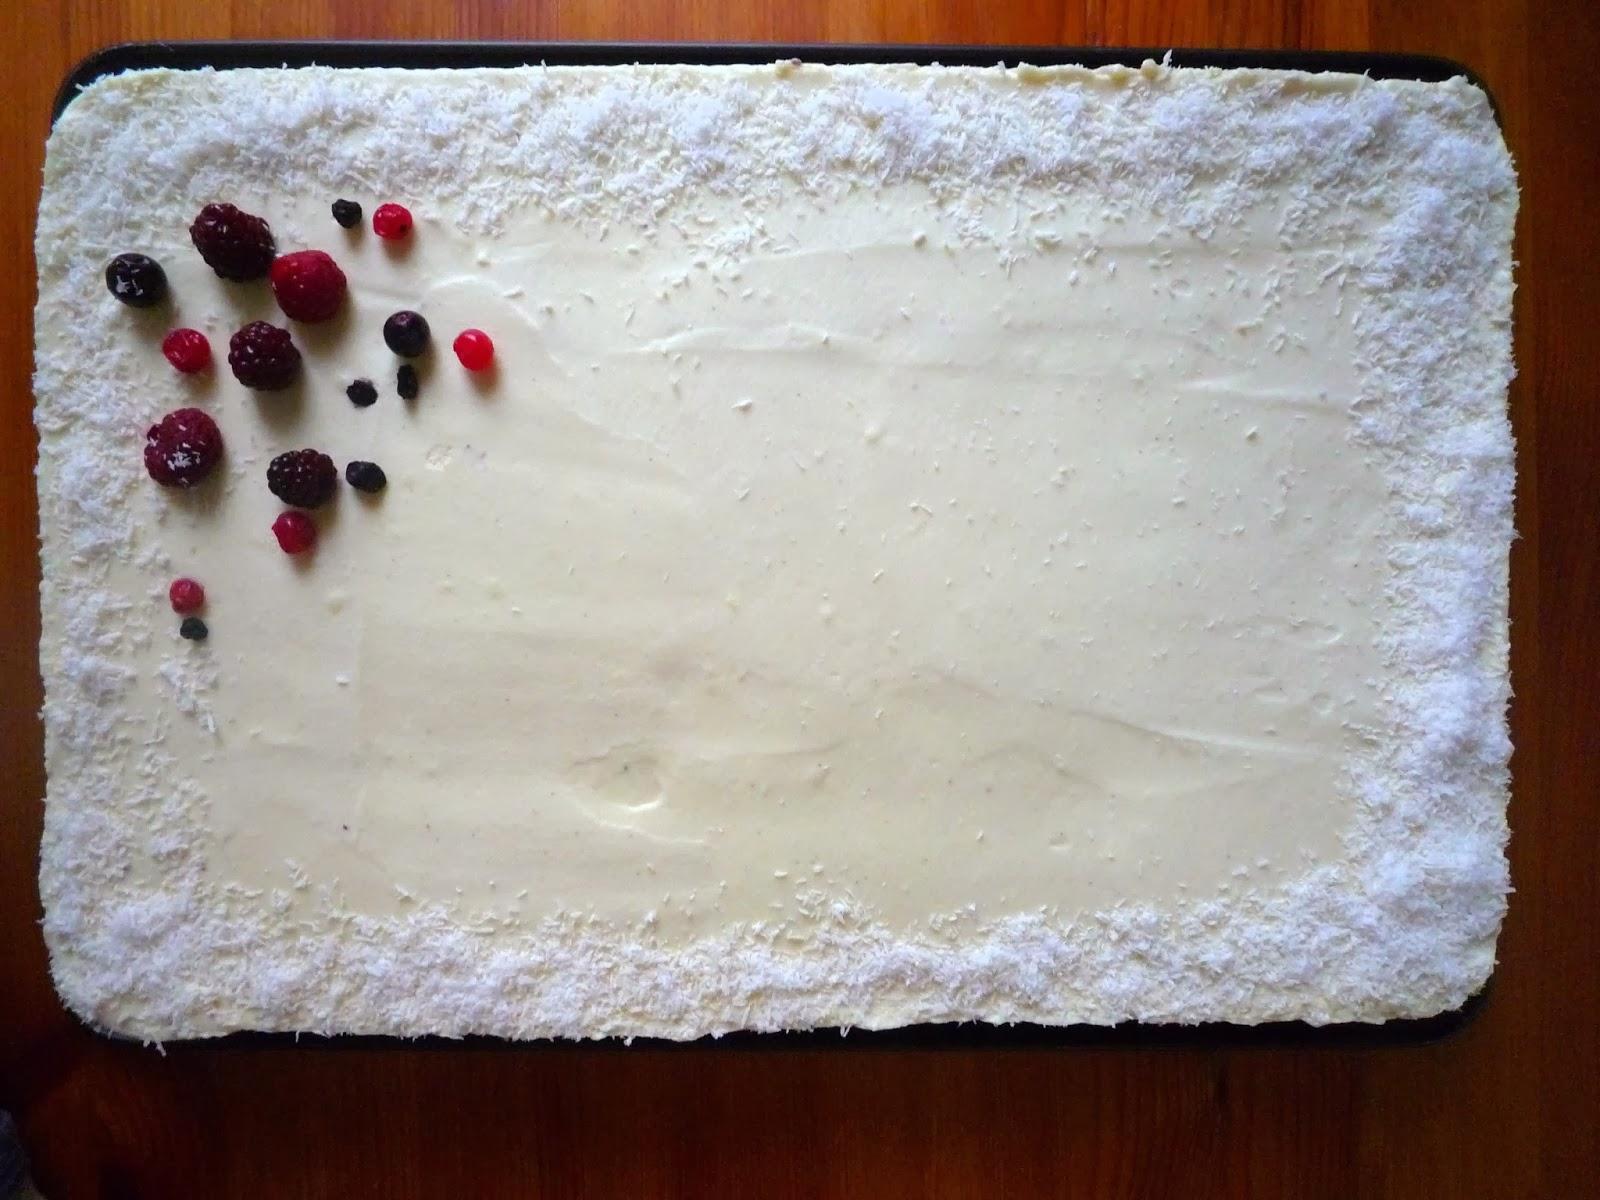 http://lagemmotaalacuina.blogspot.com.es/2014/01/pastis-de-xocolata-blanca-i-fruits.html